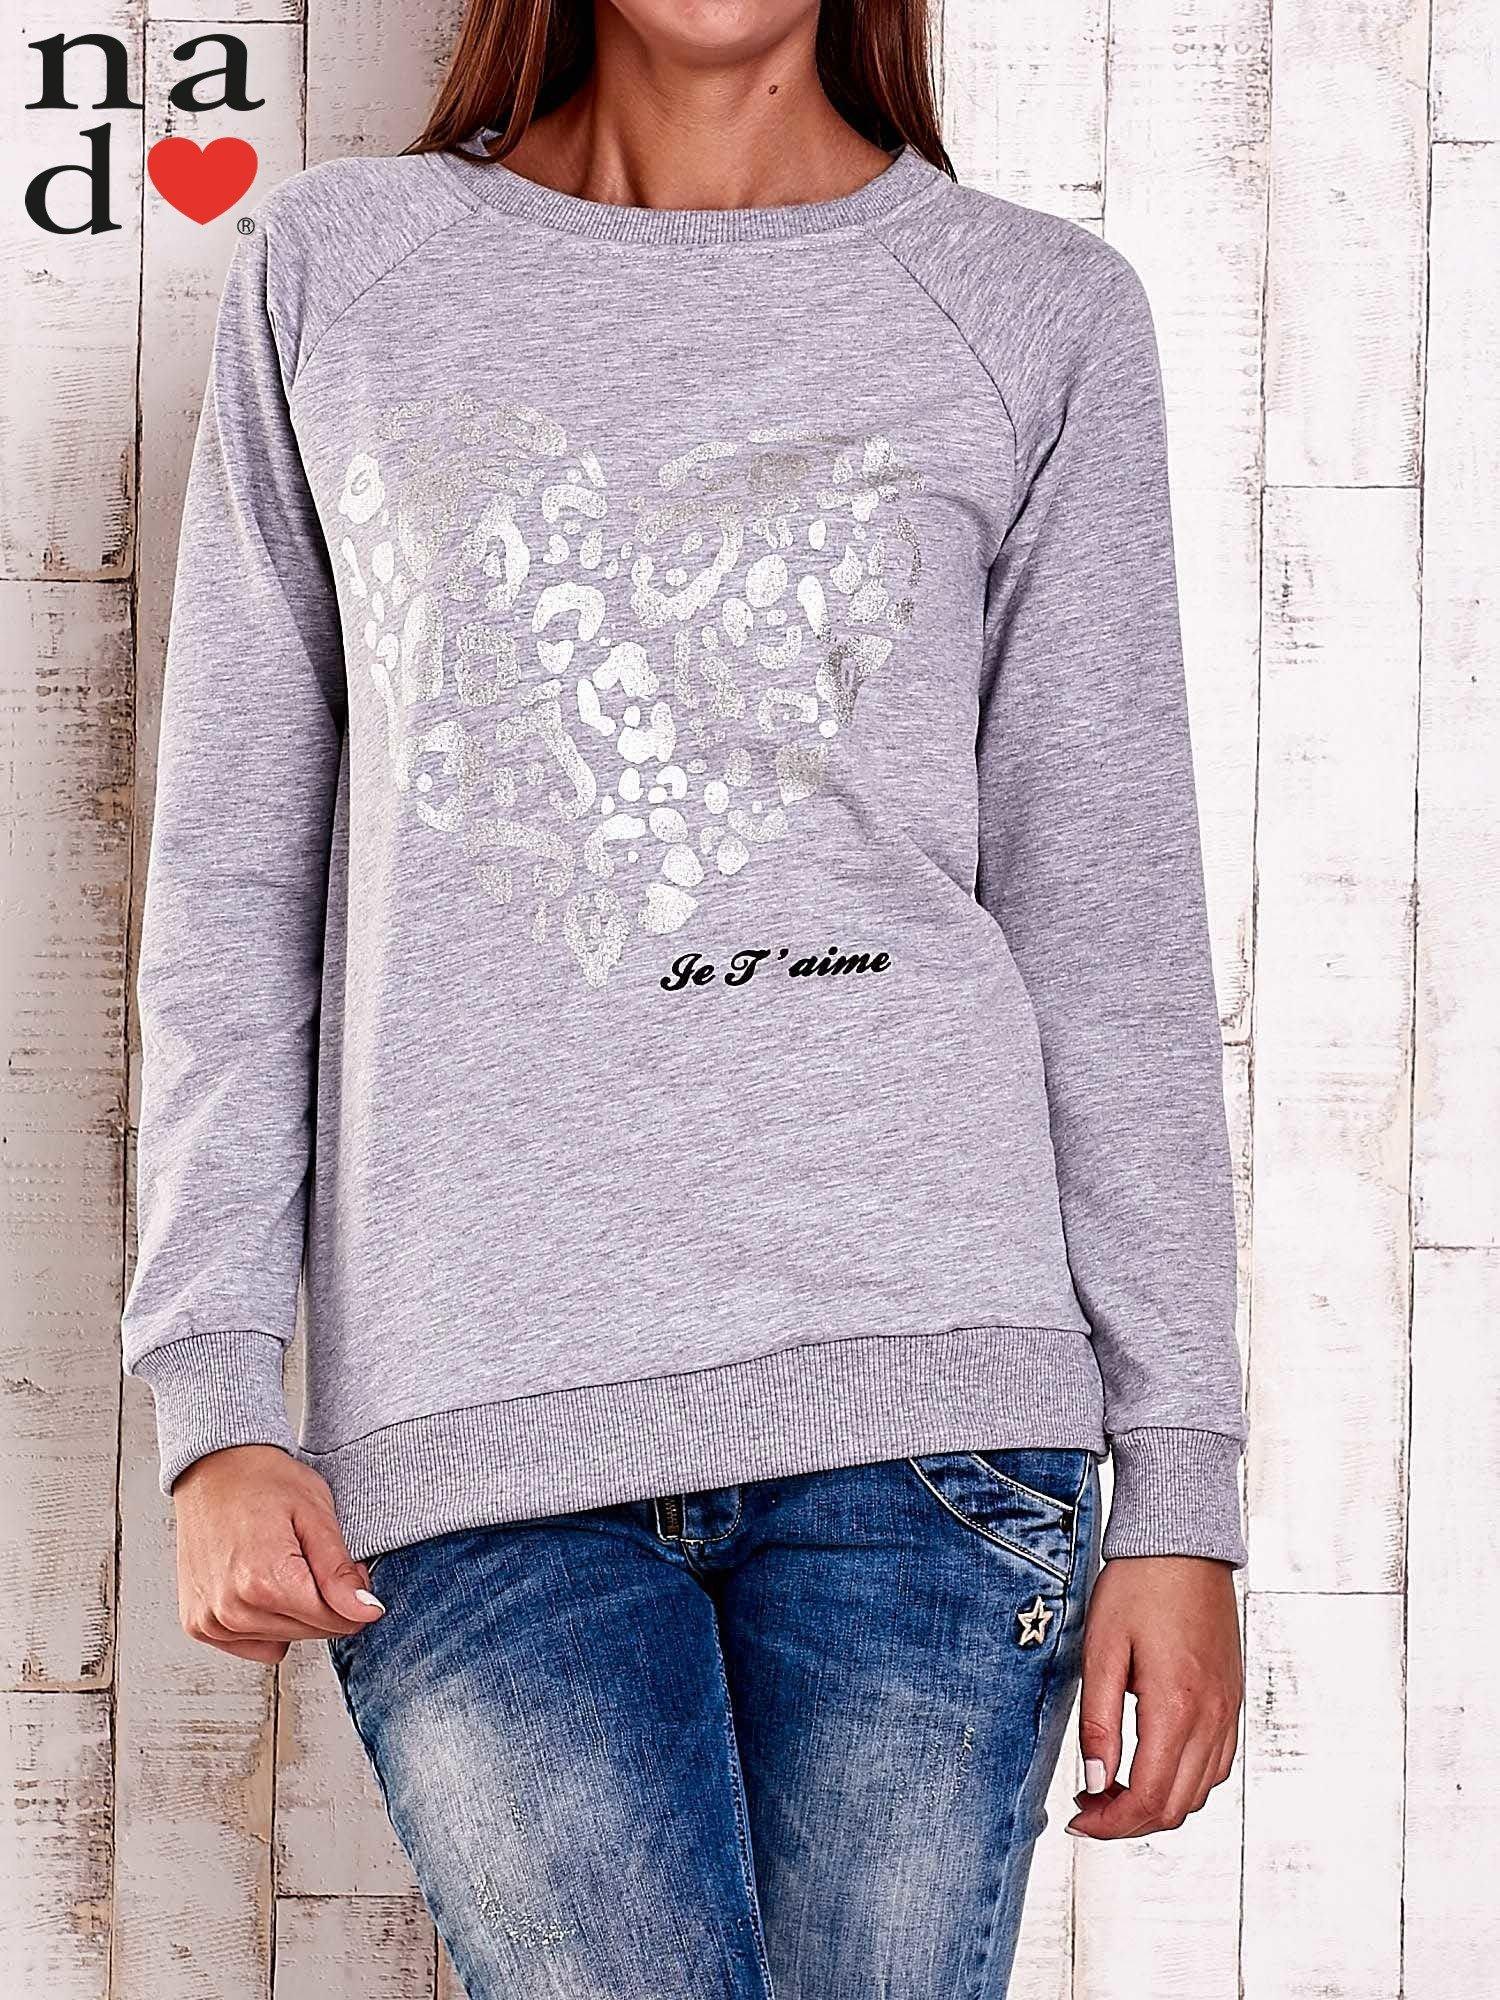 Szara bluza z nadrukiem serca i napisem JE T'AIME                                   zdj.                                  1